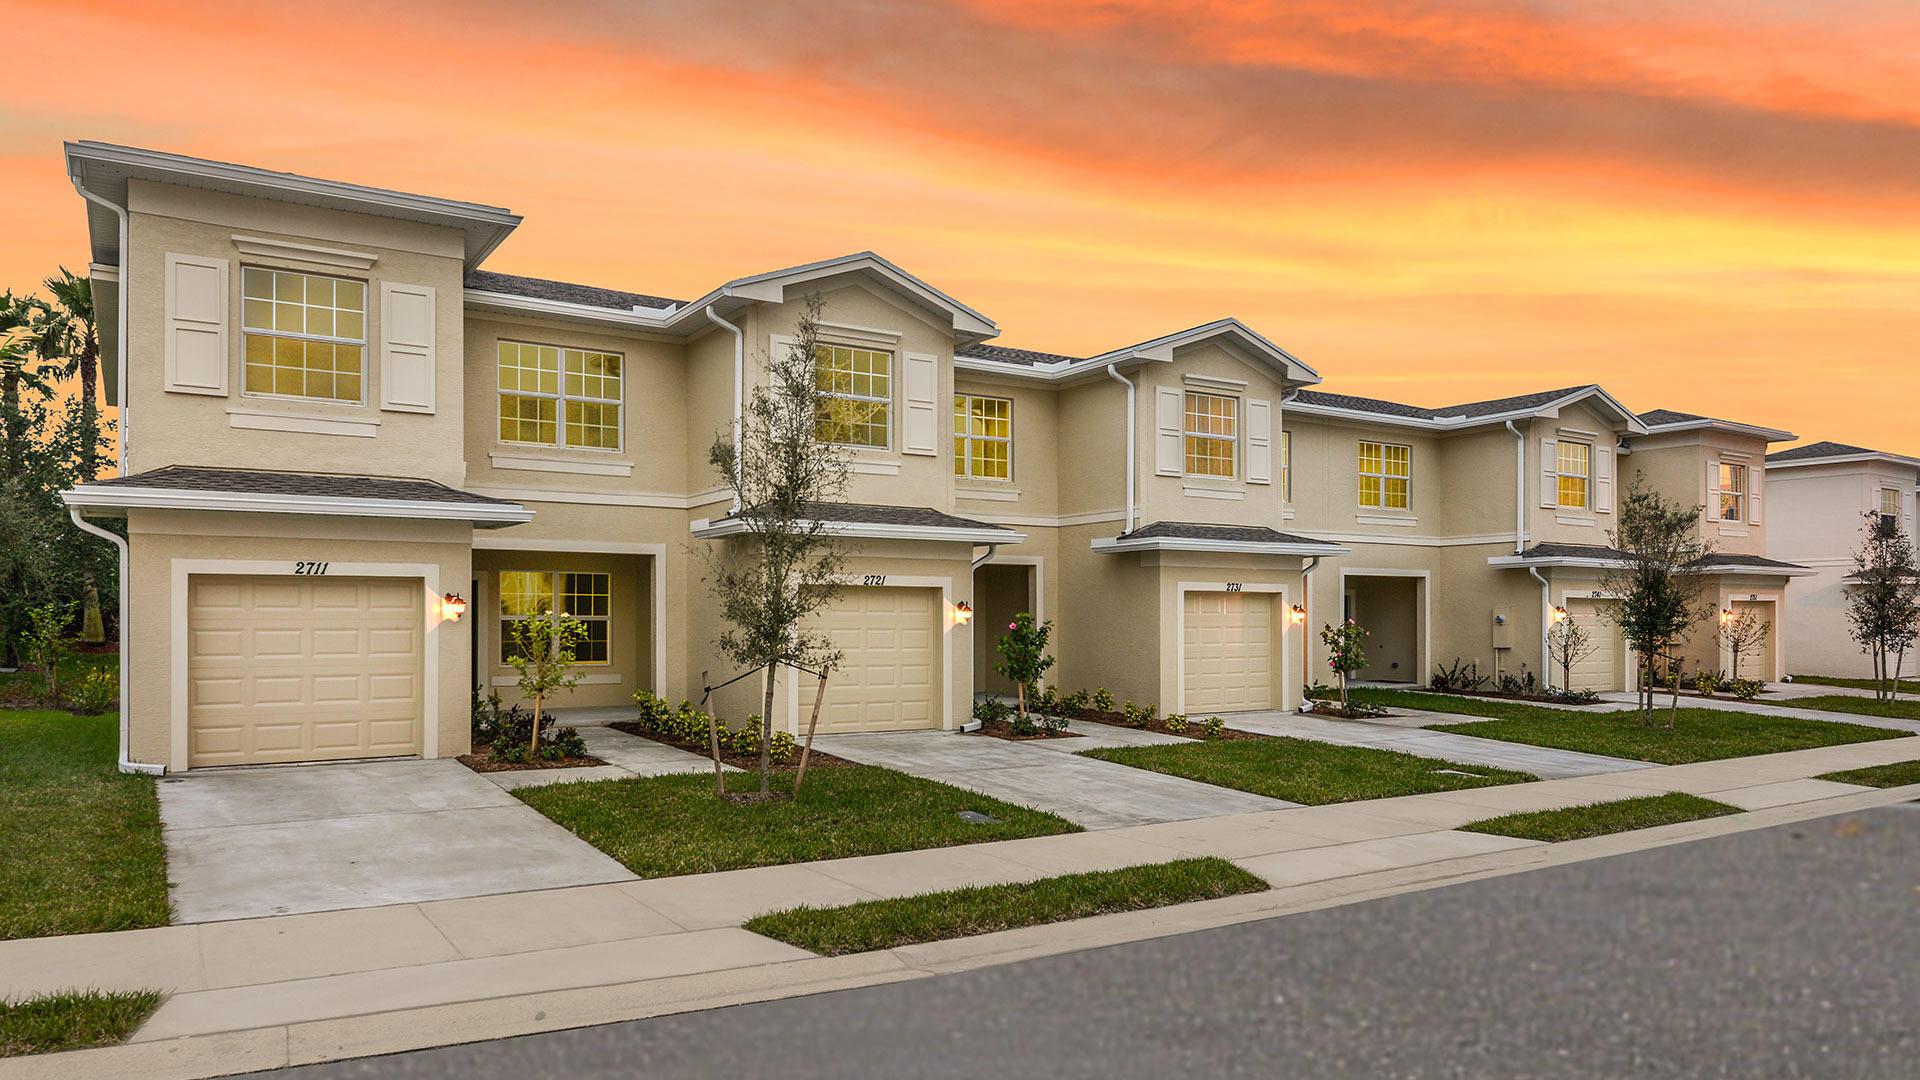 2631 NW Treviso Circle, Port Saint Lucie, Florida